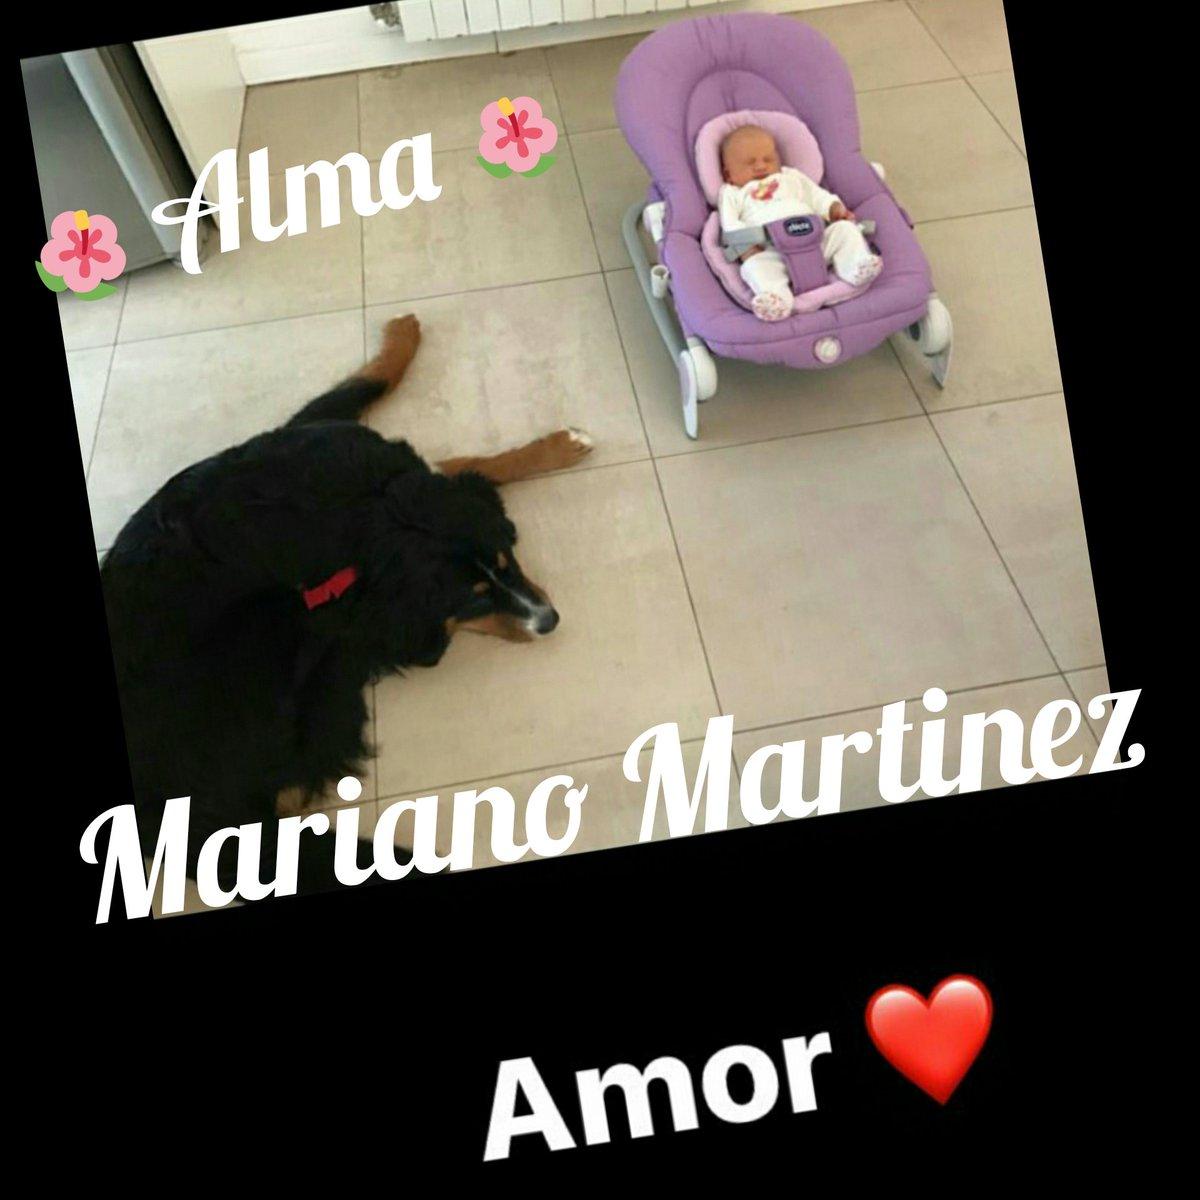 Mariano Martinez ( @mariannmartinez ) via Instagram Stories  #Alma  #marianomartinez #amor  <br>http://pic.twitter.com/z8qquhPH1J